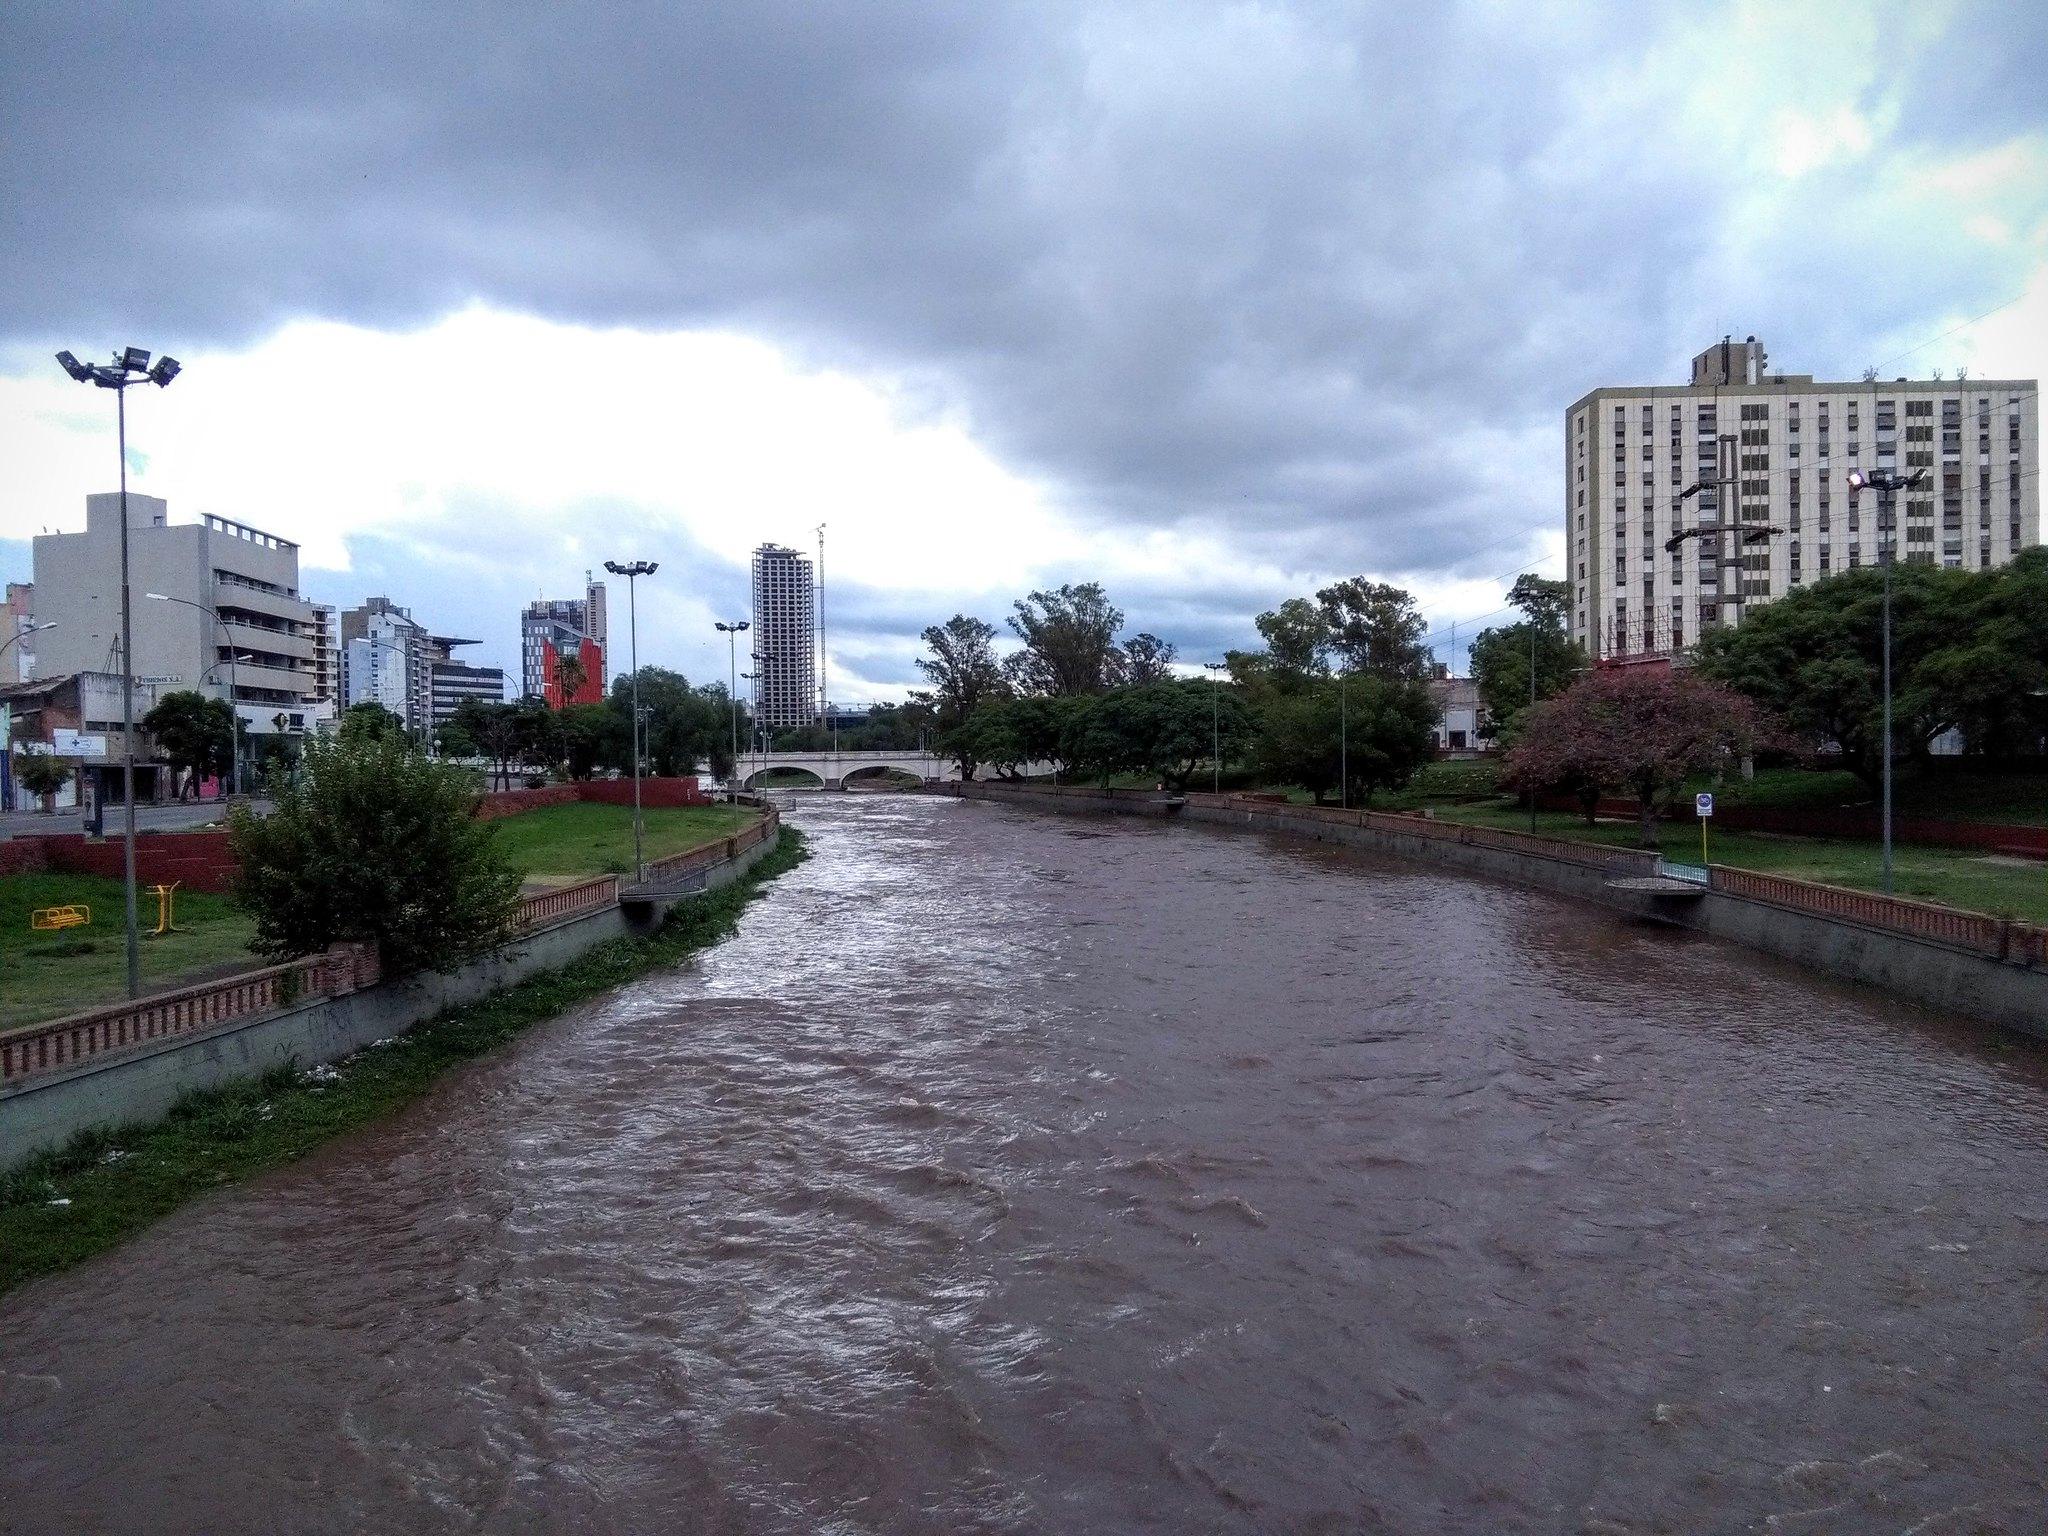 Río Suquía in Córdoba